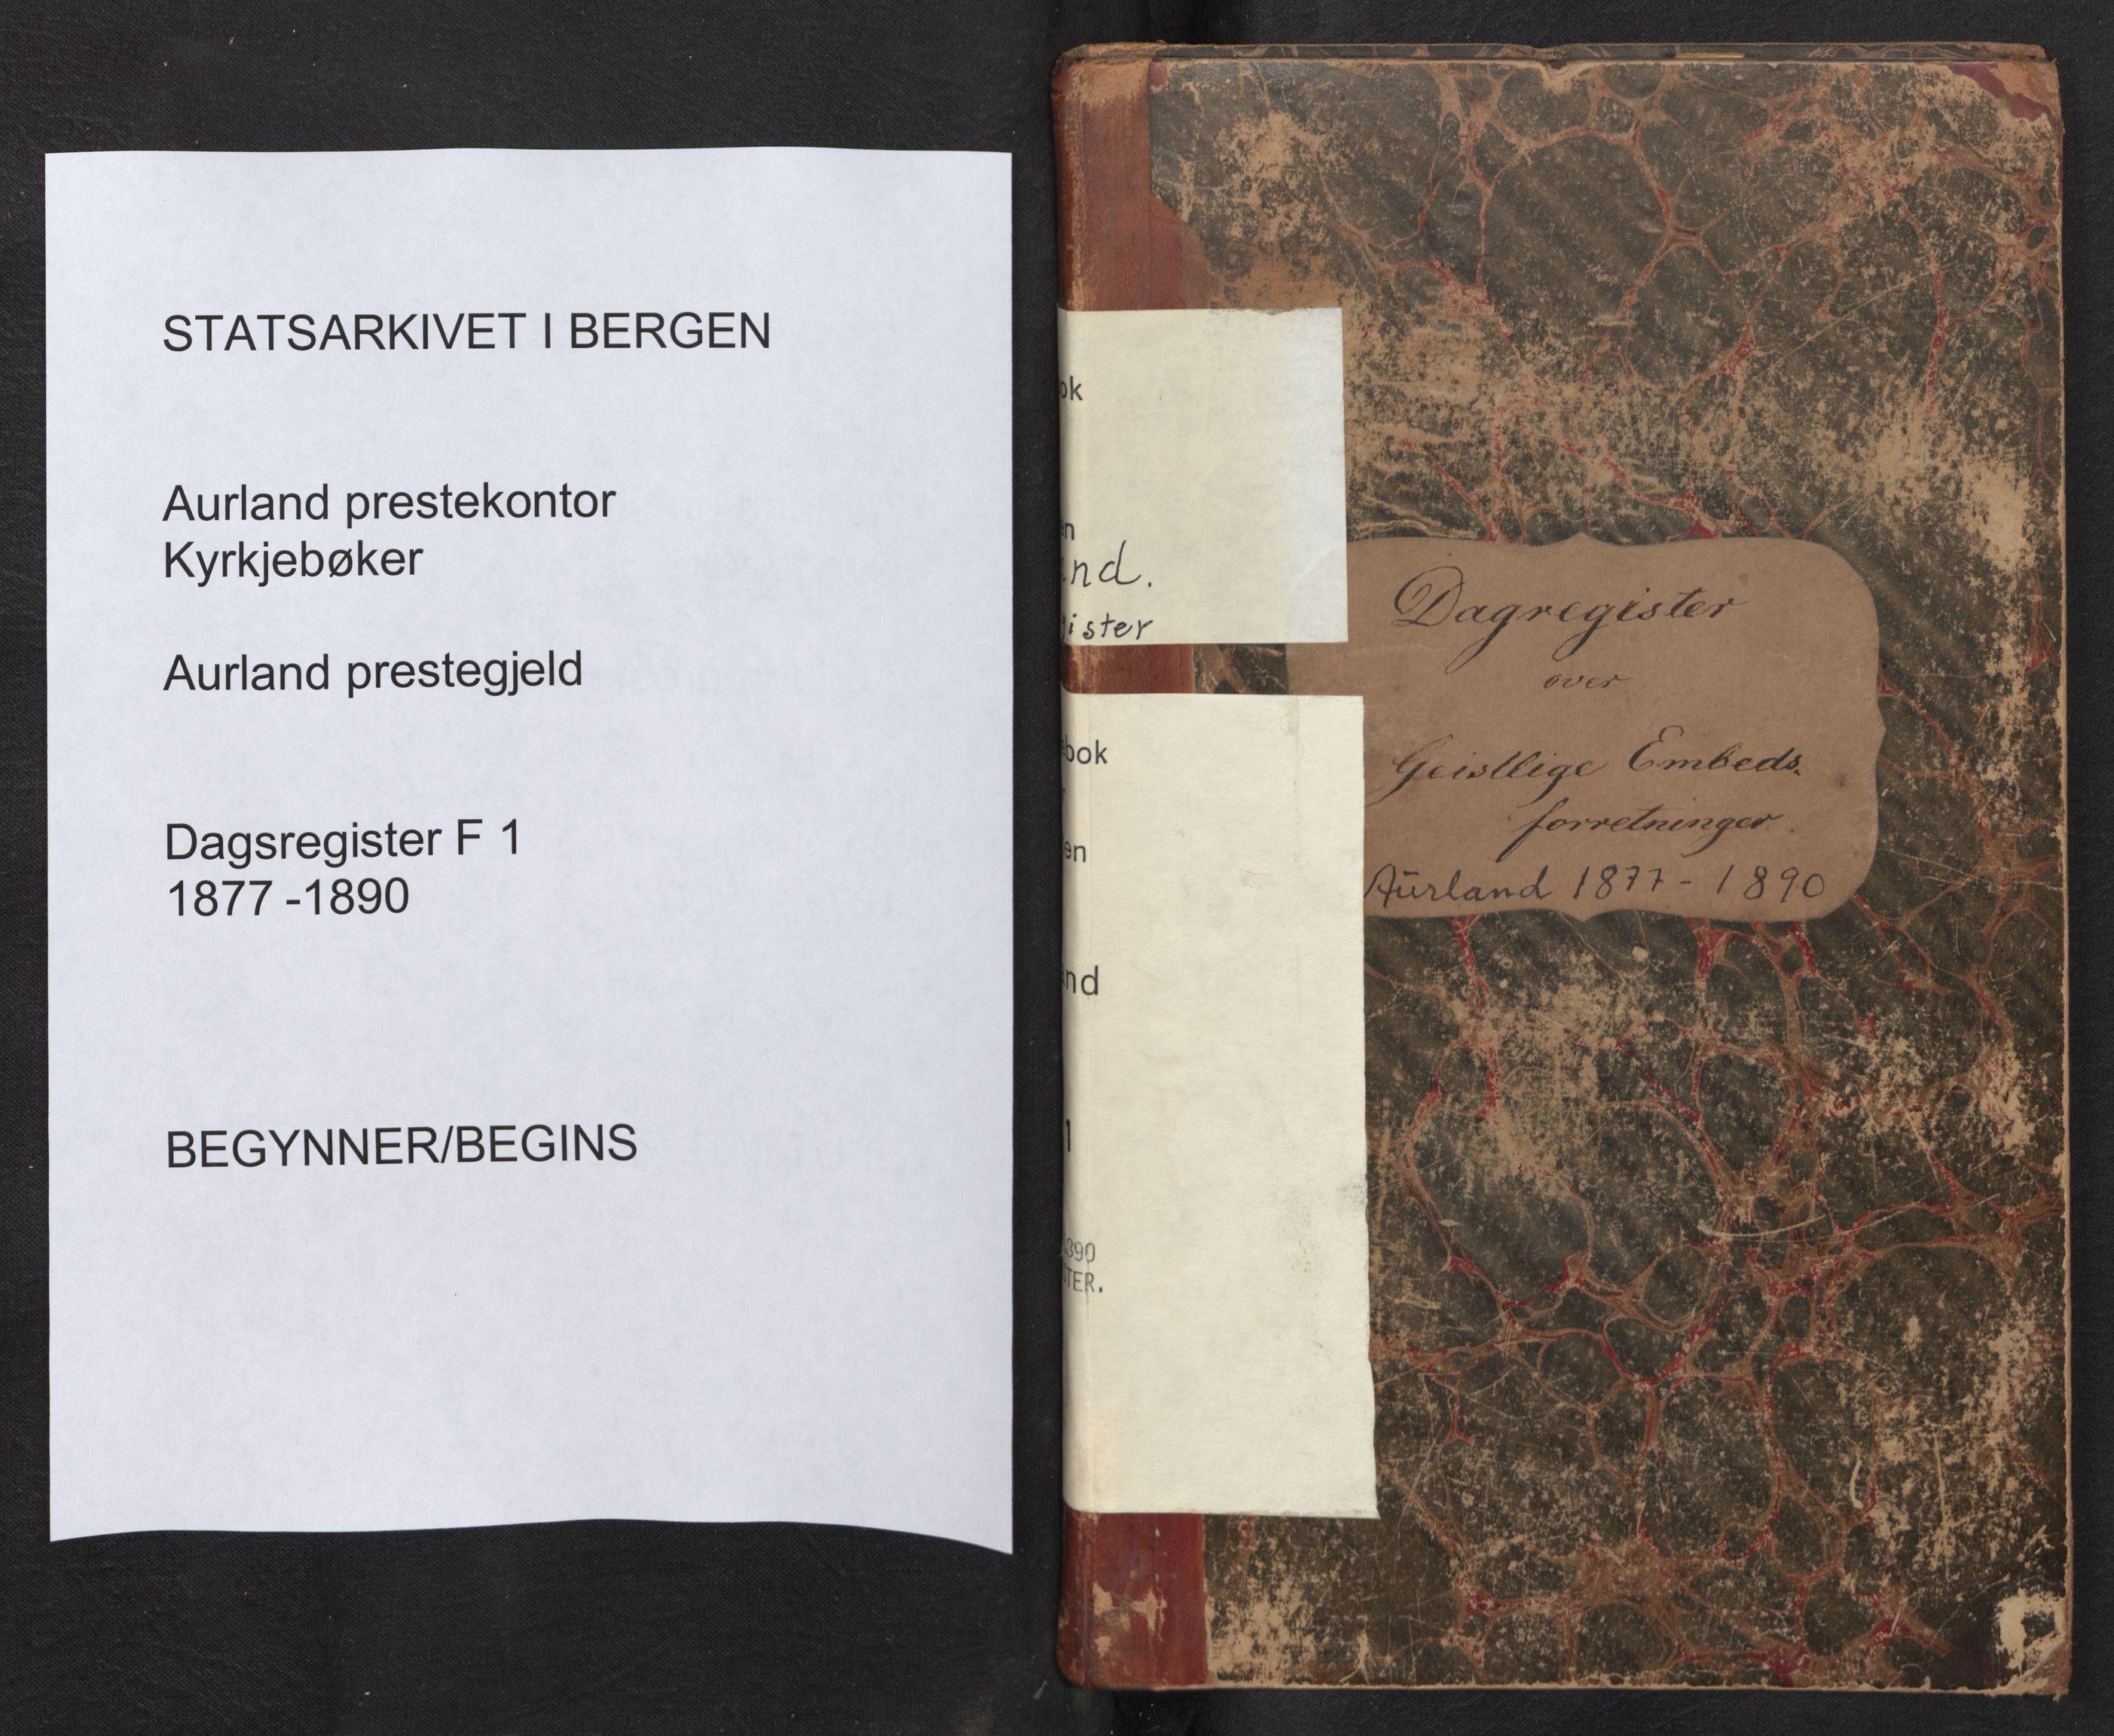 SAB, Aurland Sokneprestembete*, Dagregister nr. F 1, 1877-1890